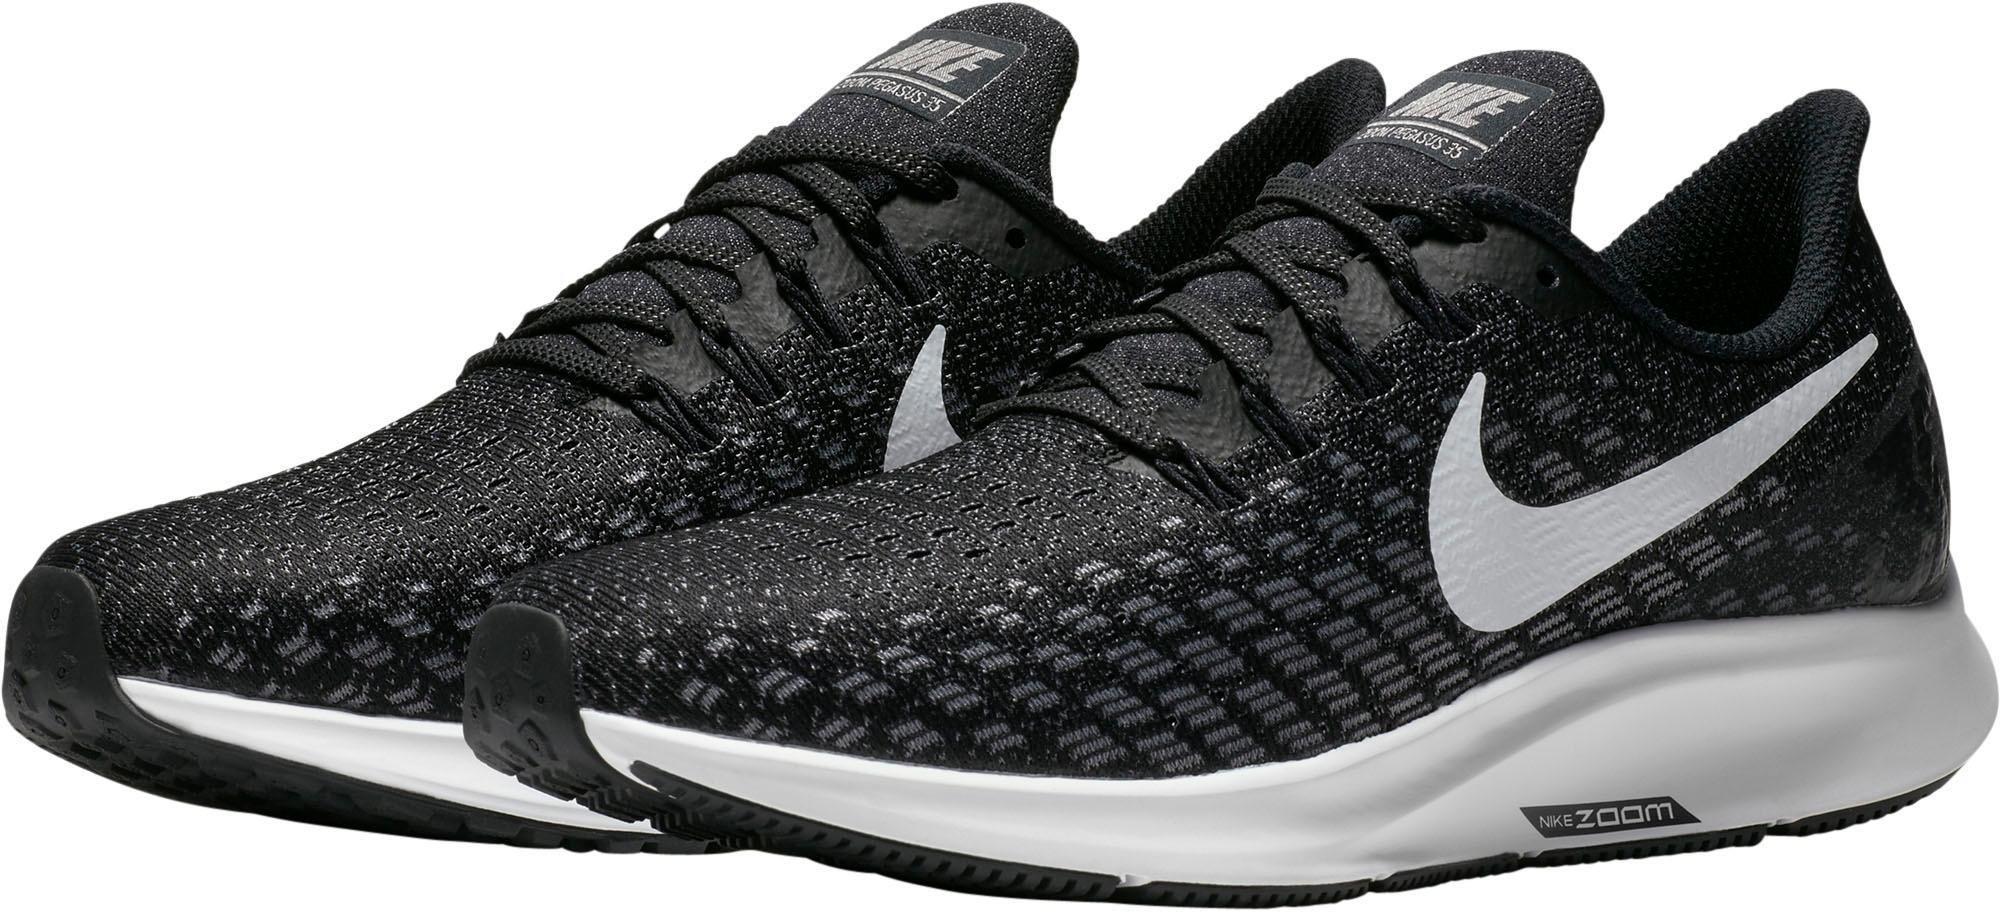 2a8906f7c1c ... Nike Sportswear sneakers »Wmns Air Pegasus '83«, Nike runningschoenen  »Wmns Air Zoom Pegasus 35«, Nike runningschoenen »Wmns Air Zoom Pegasus  35«, ...